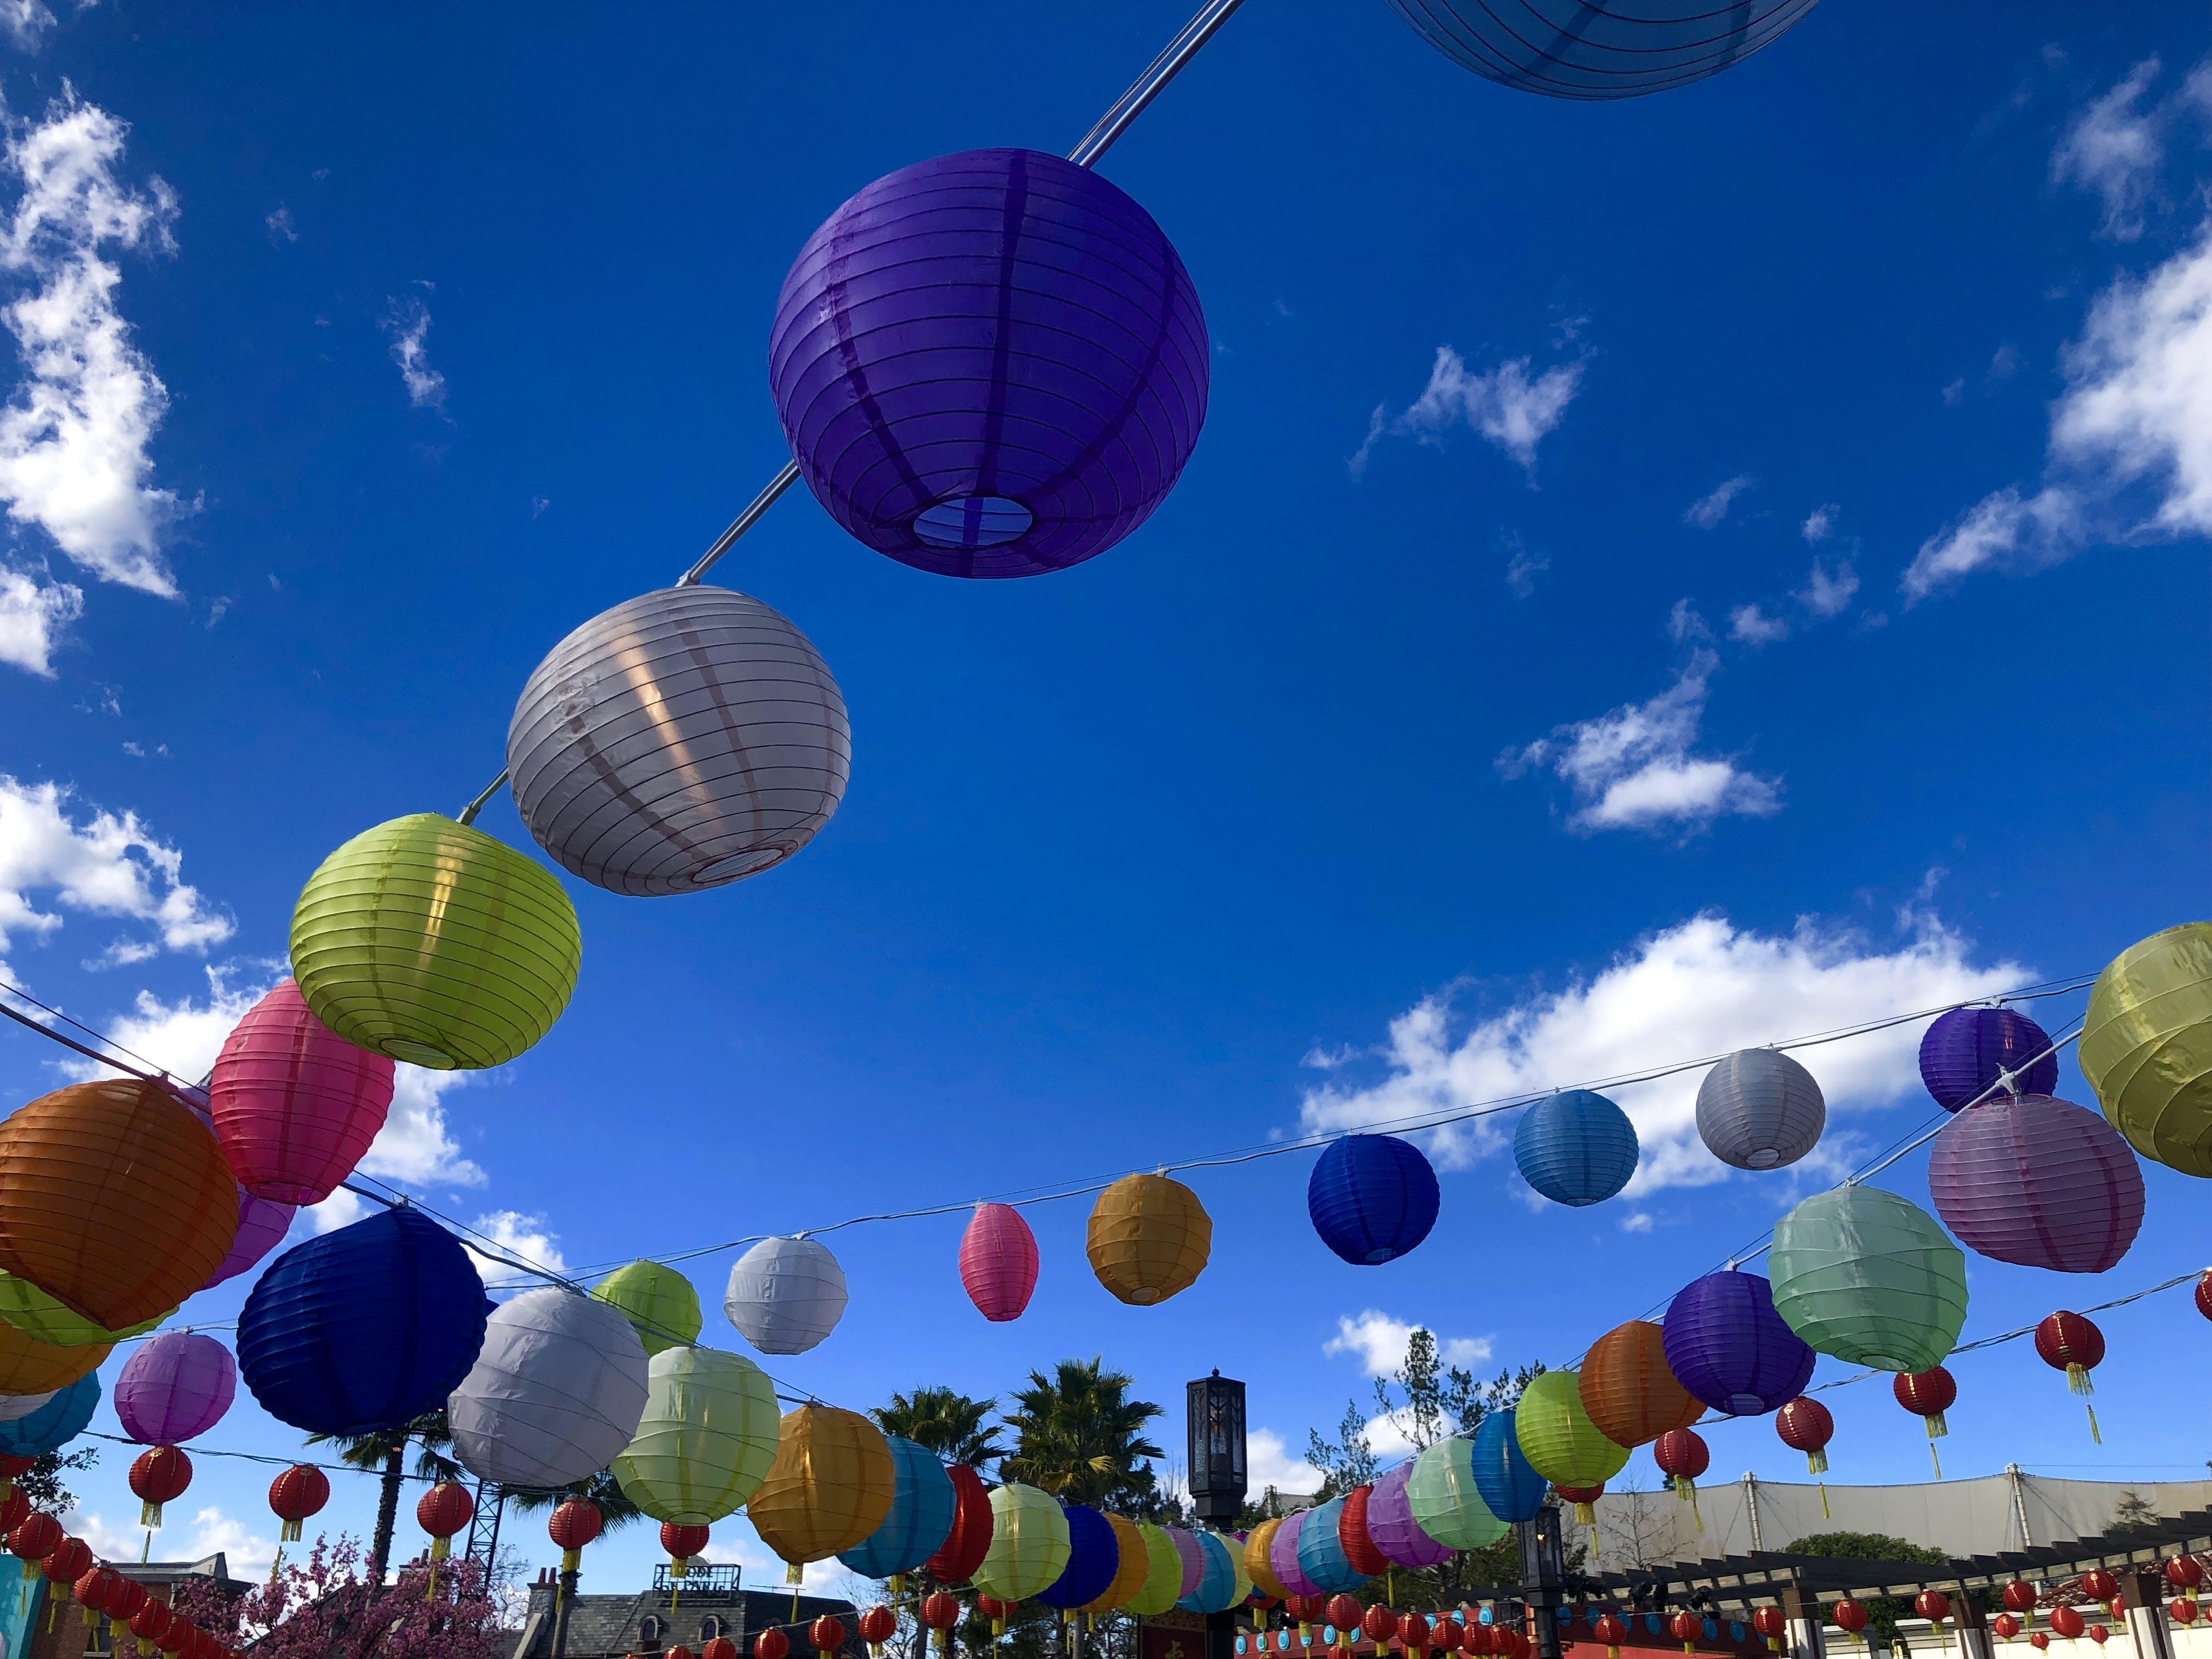 Free stock photo of blue sky, chinese lanterns, palm trees, paper lantern